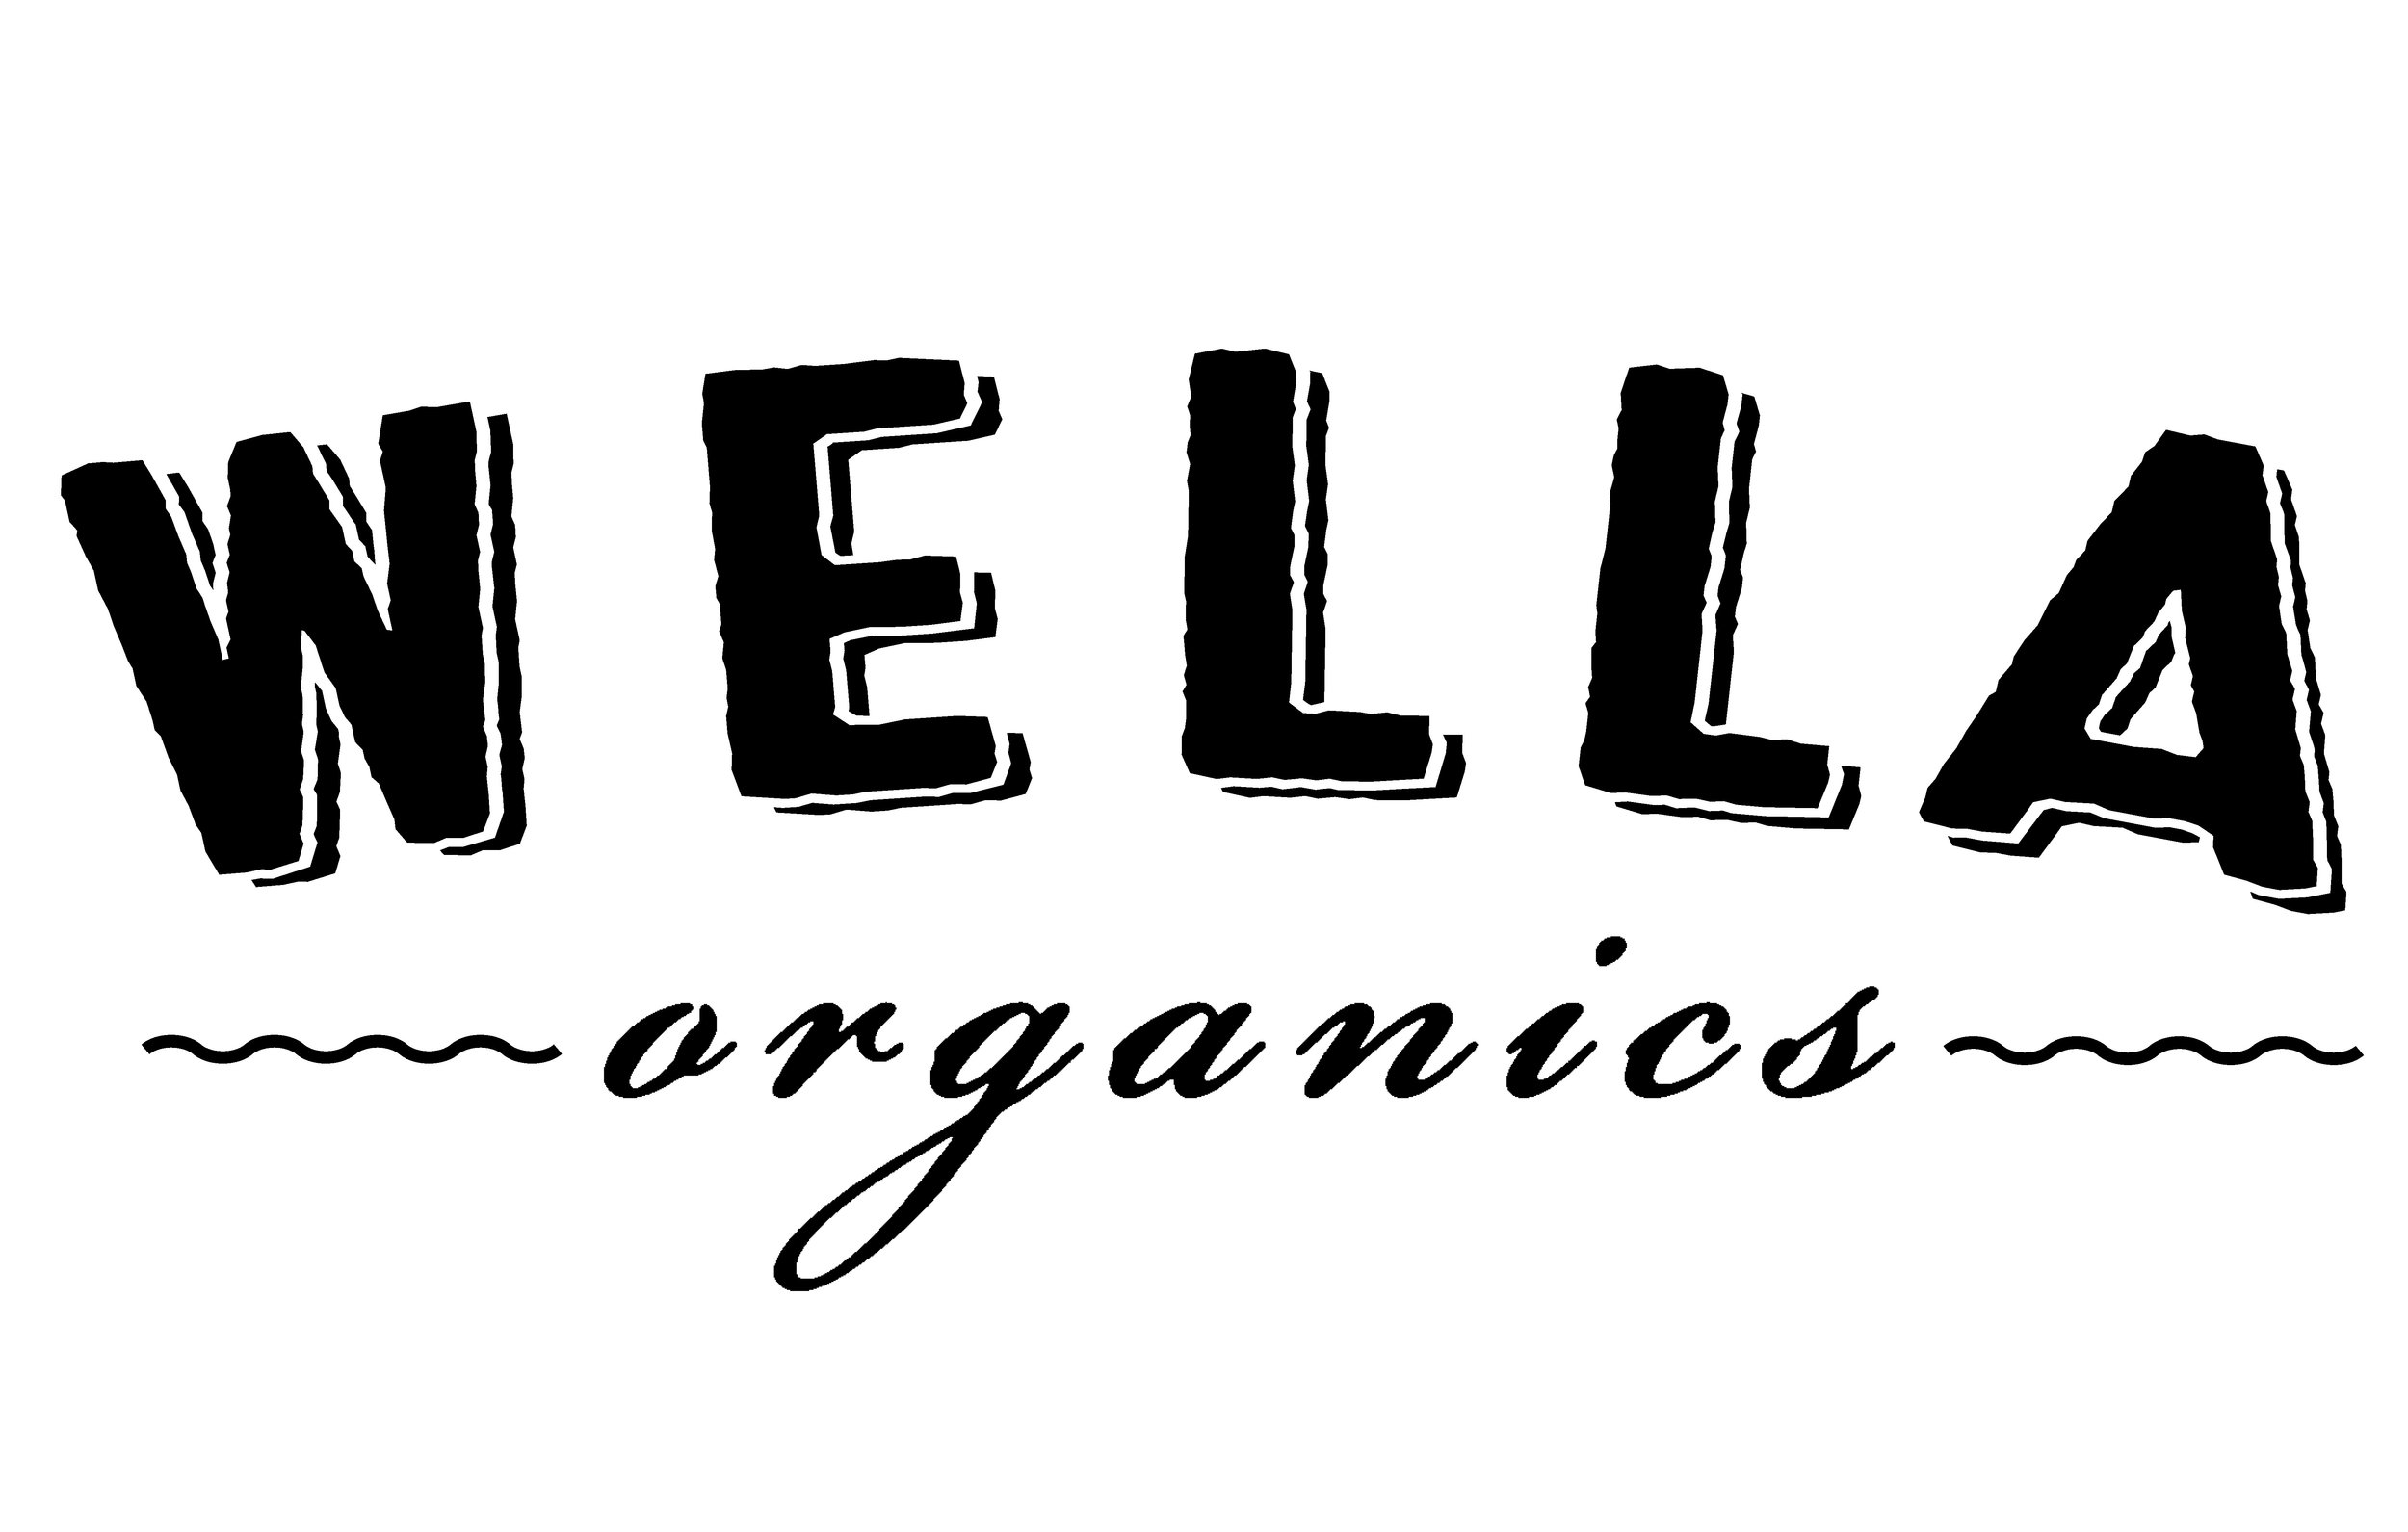 Wella O Logo 5.5 x 3.5 in.jpg